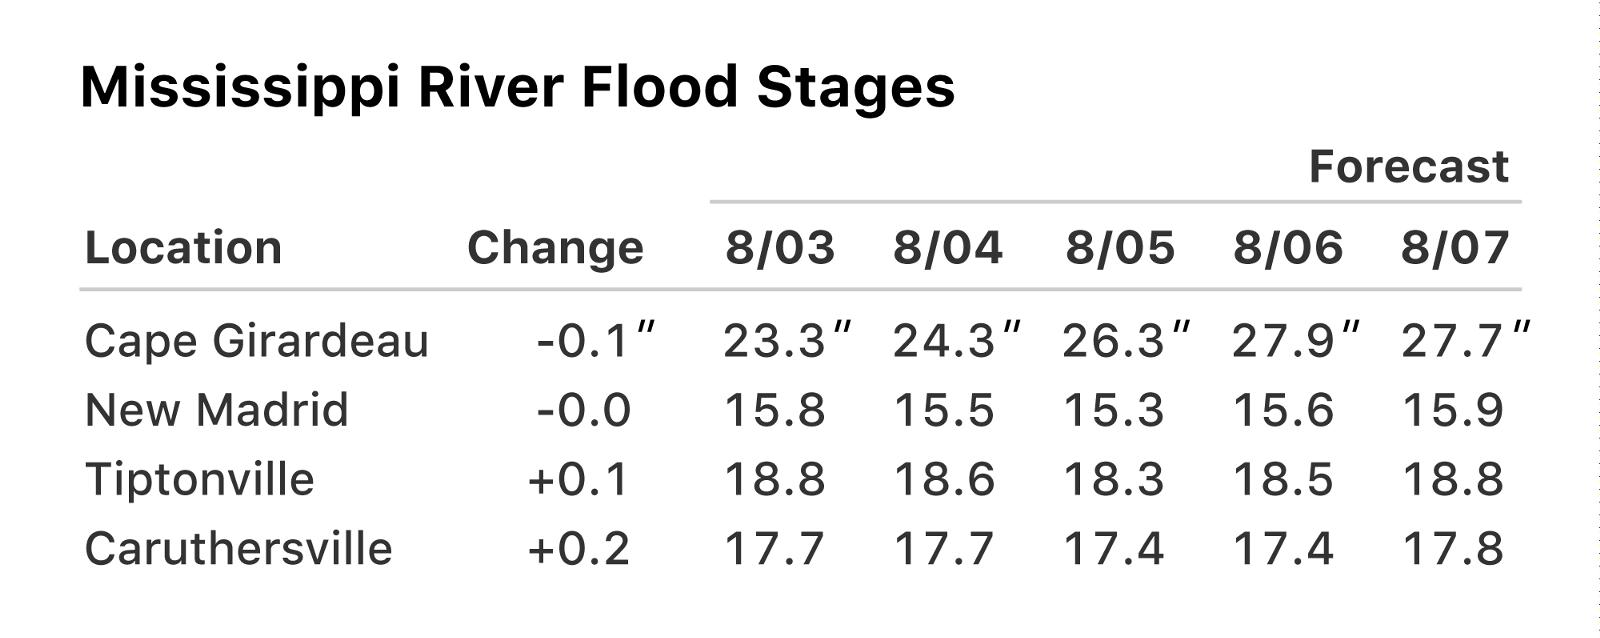 Mississippi River Flood Stage Forecast - NOAA